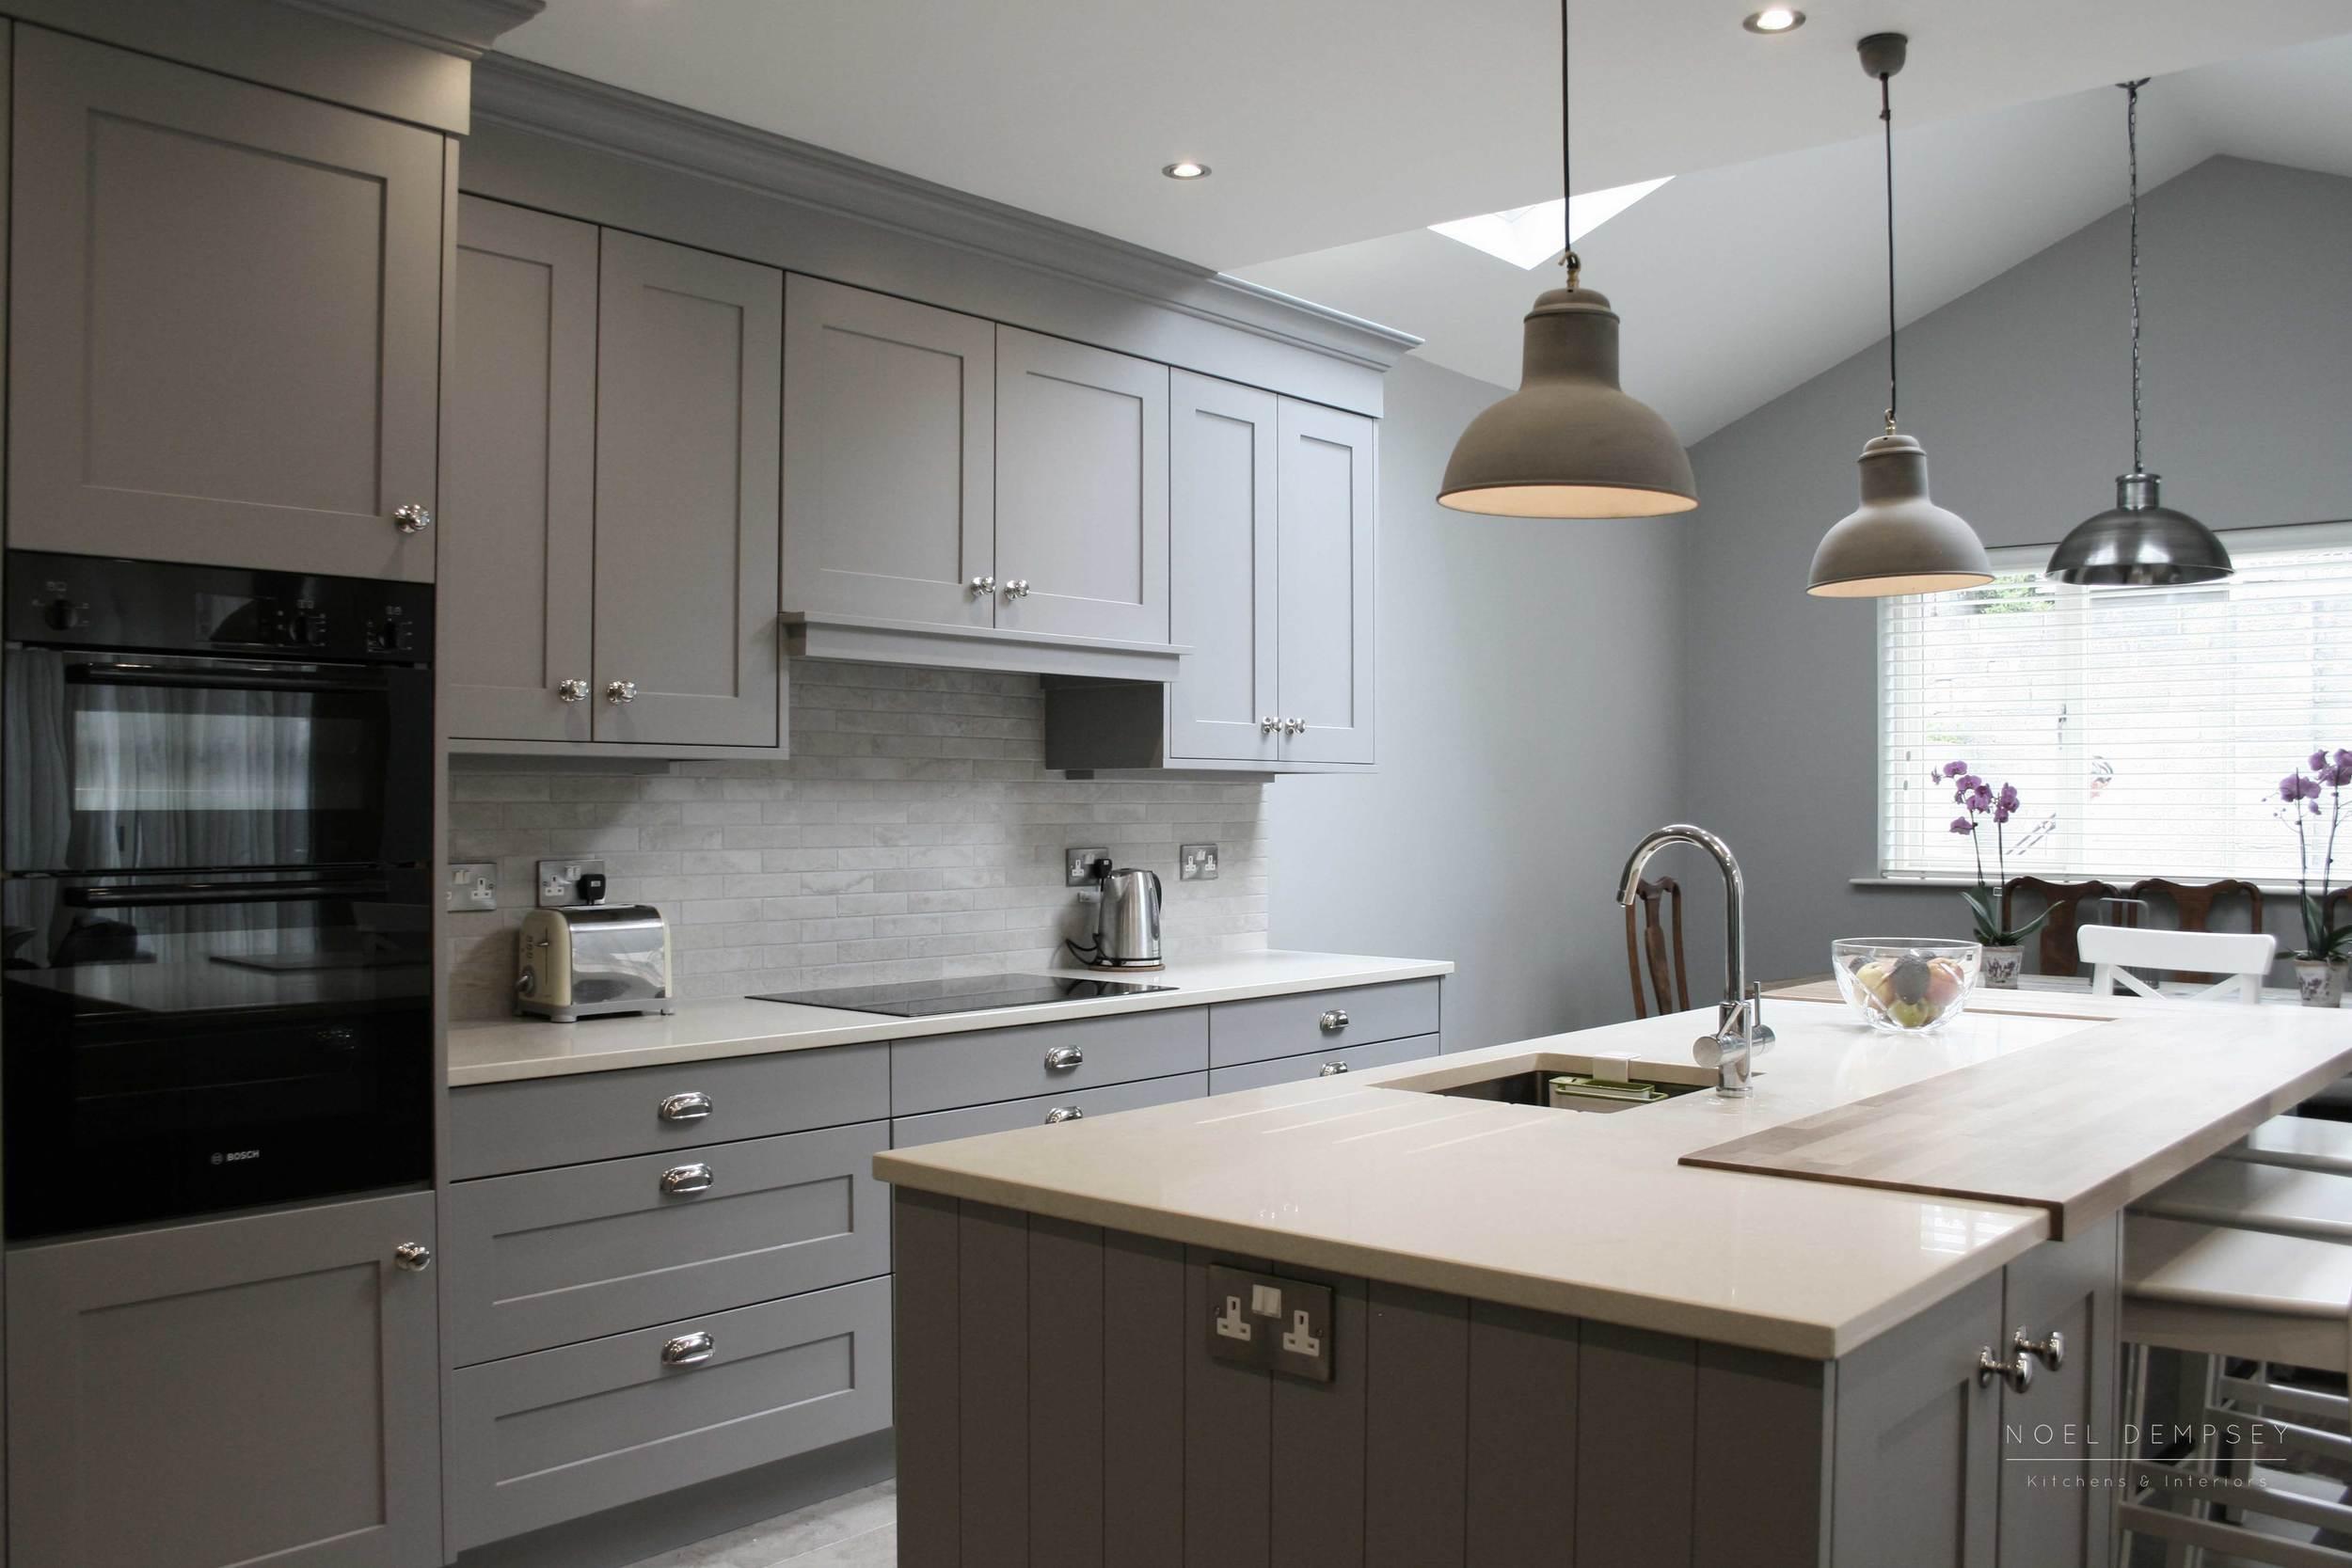 Mount-Anville-Kitchen-Dublin-2.jpg